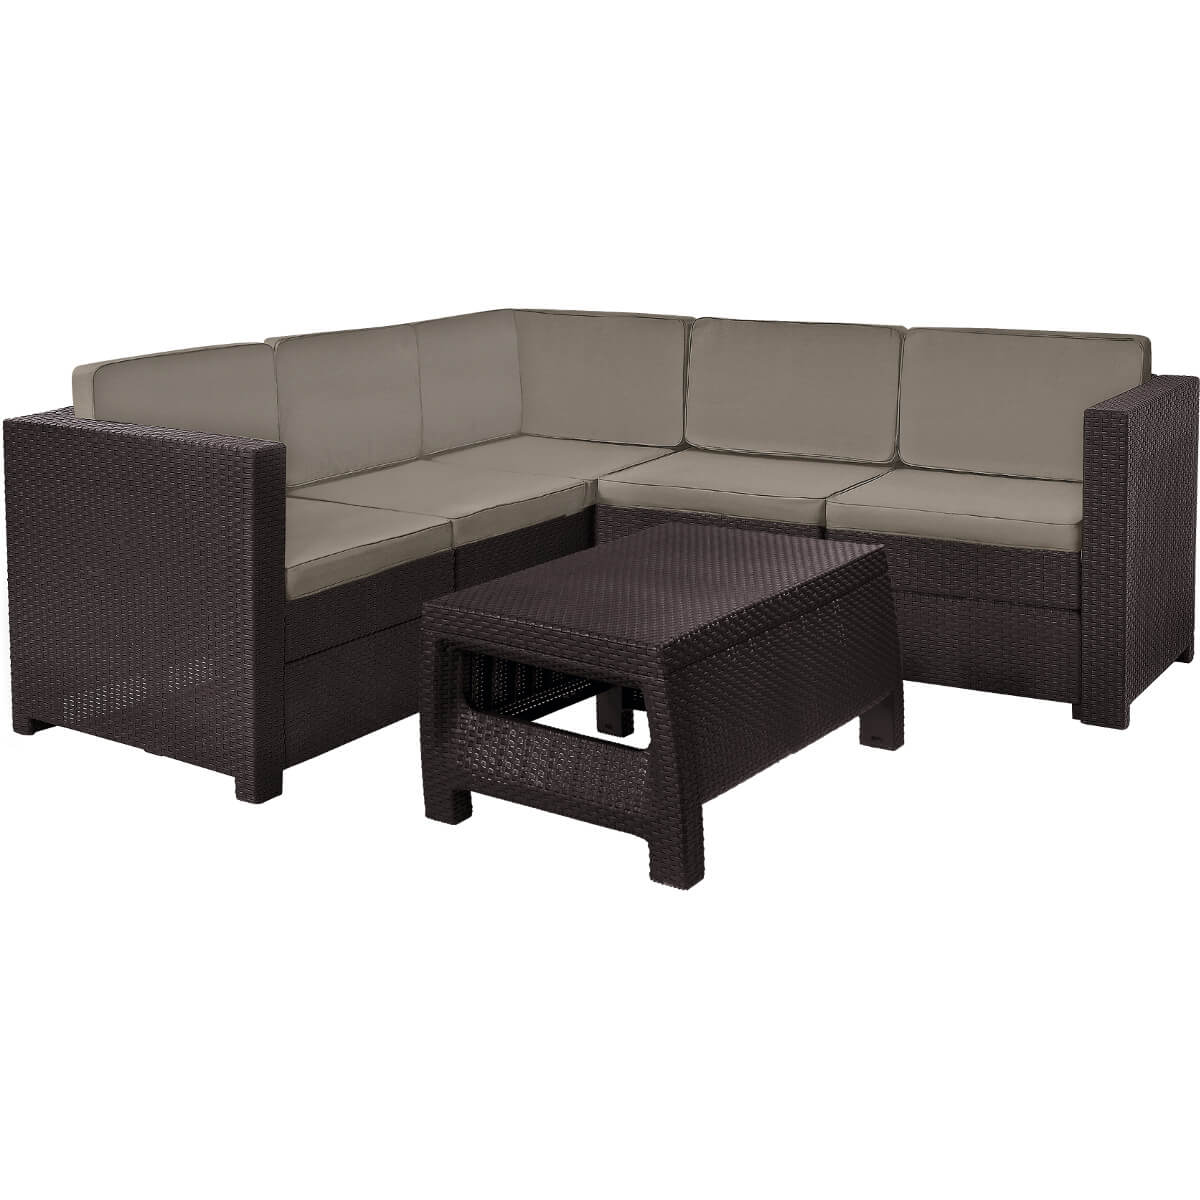 Угловой комплект мебели Keter Provence 17204454